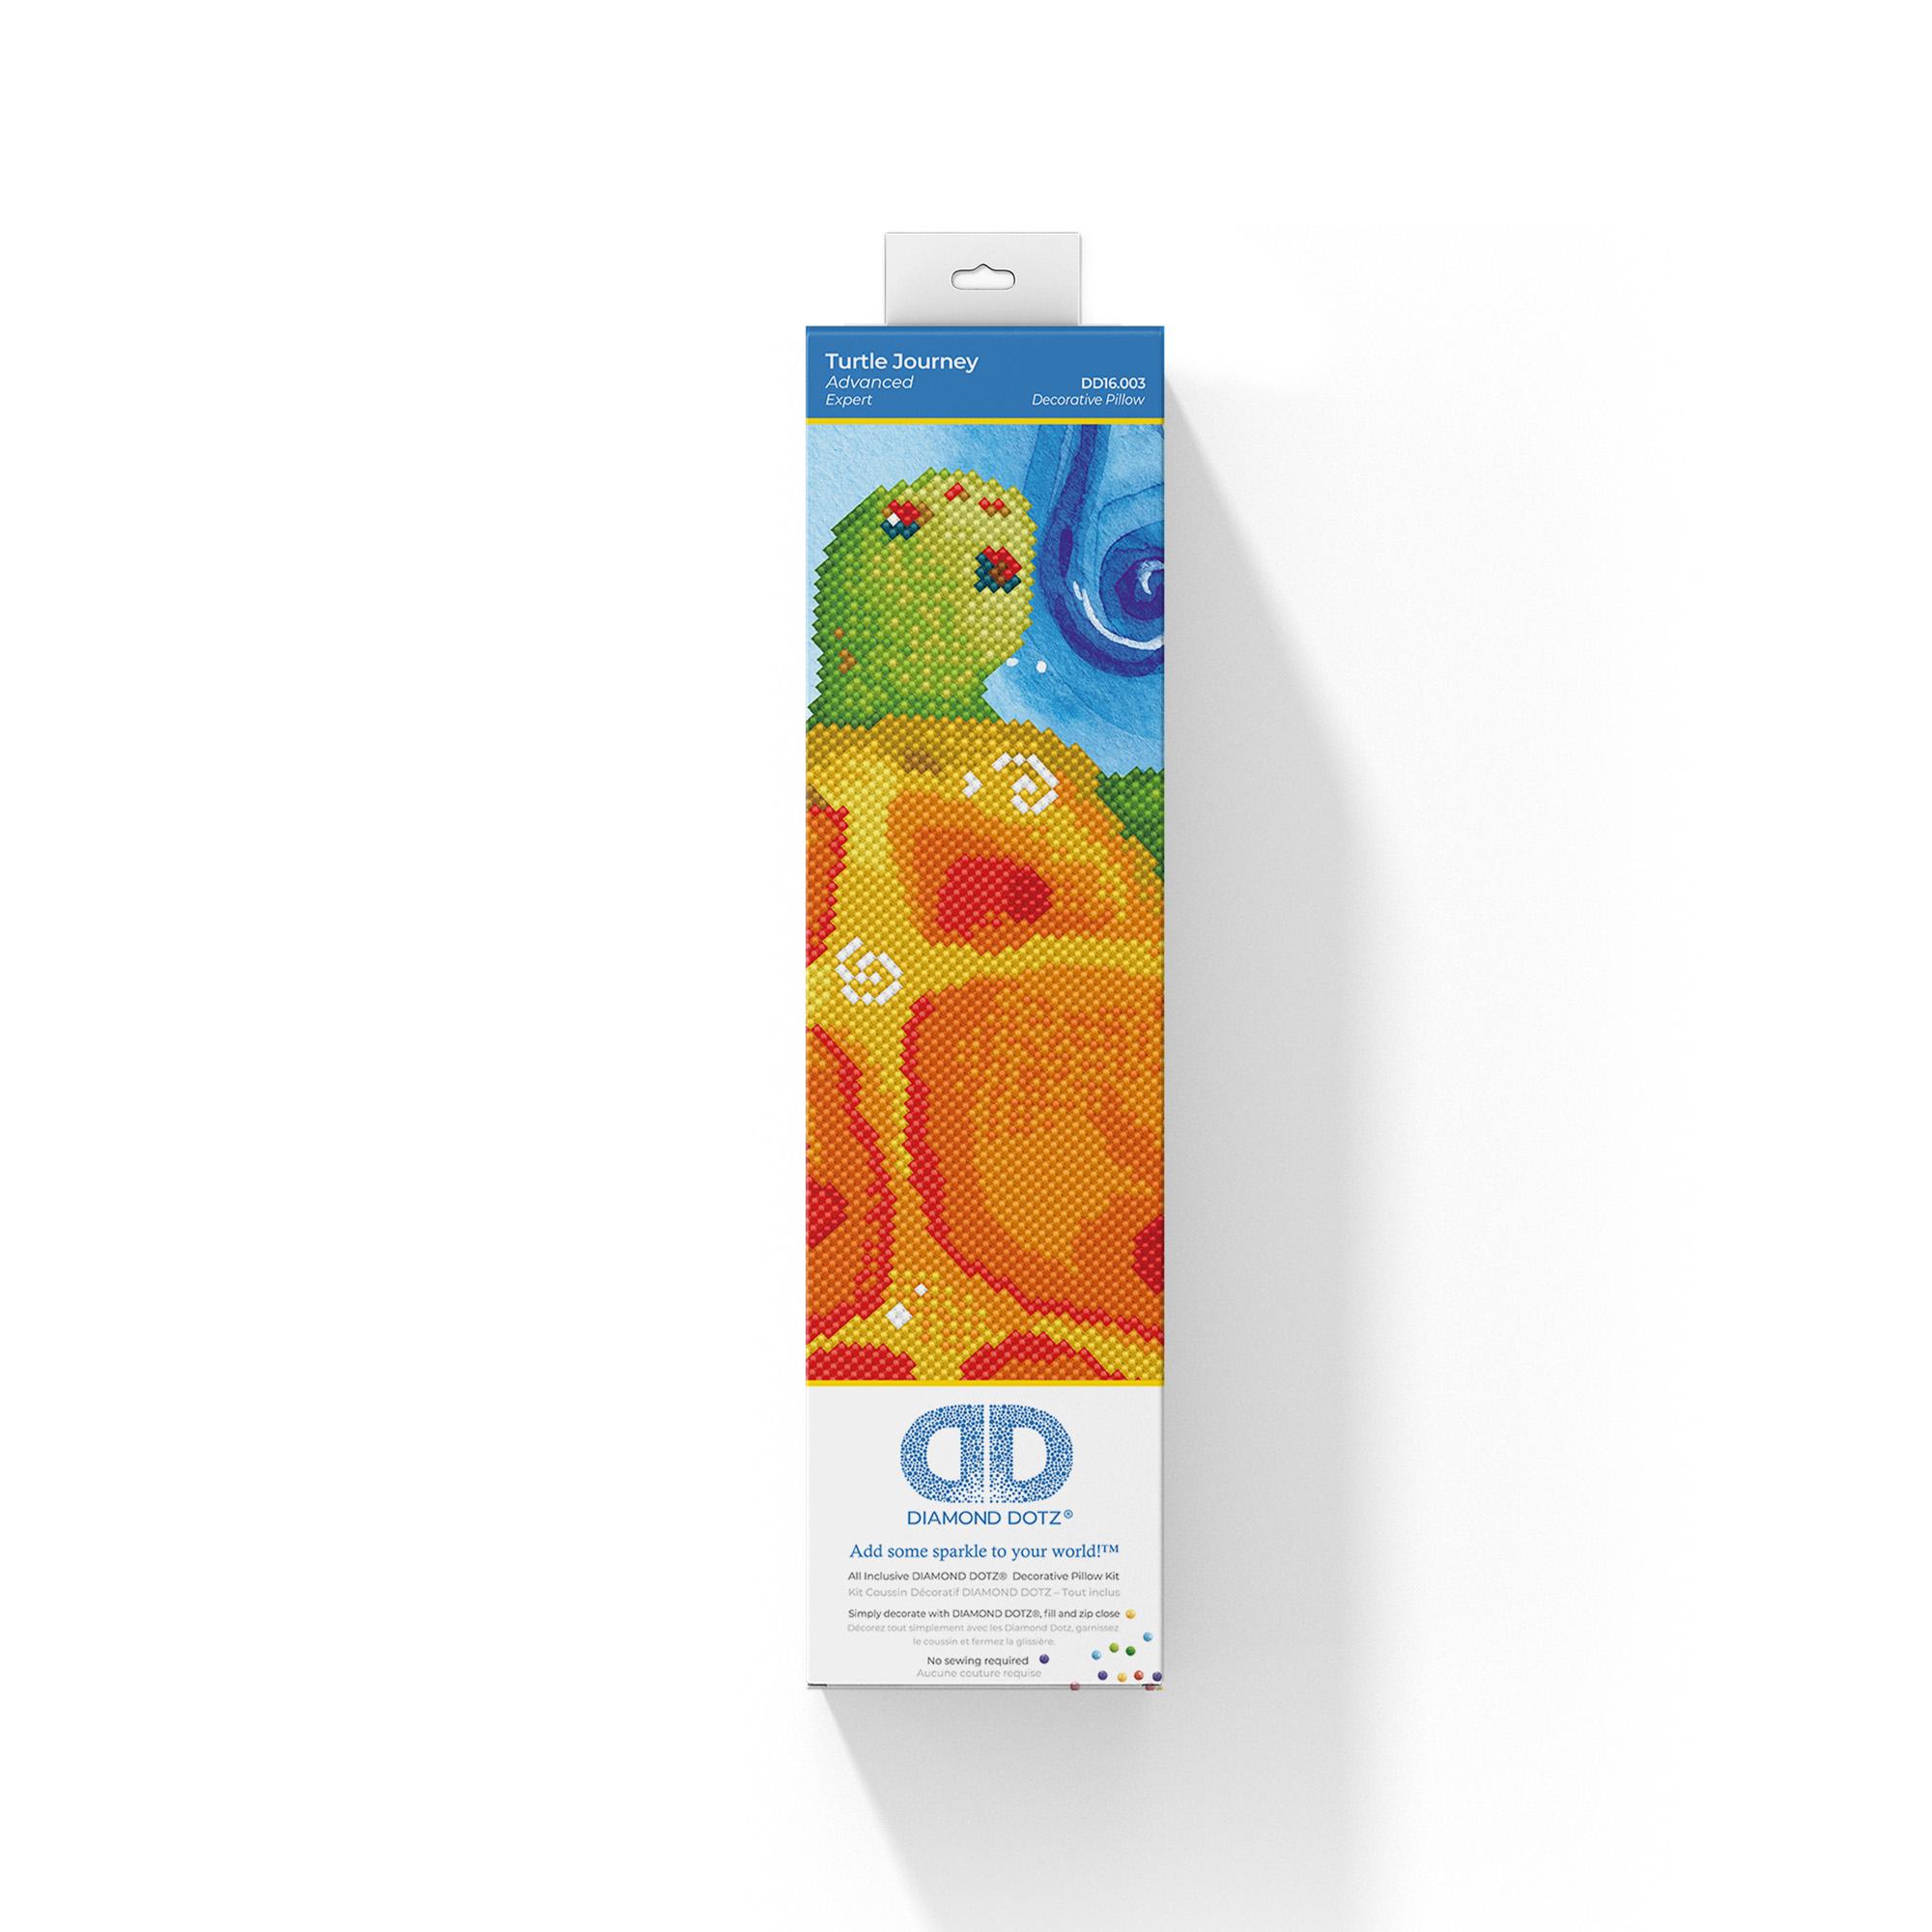 DD16.003_packaging